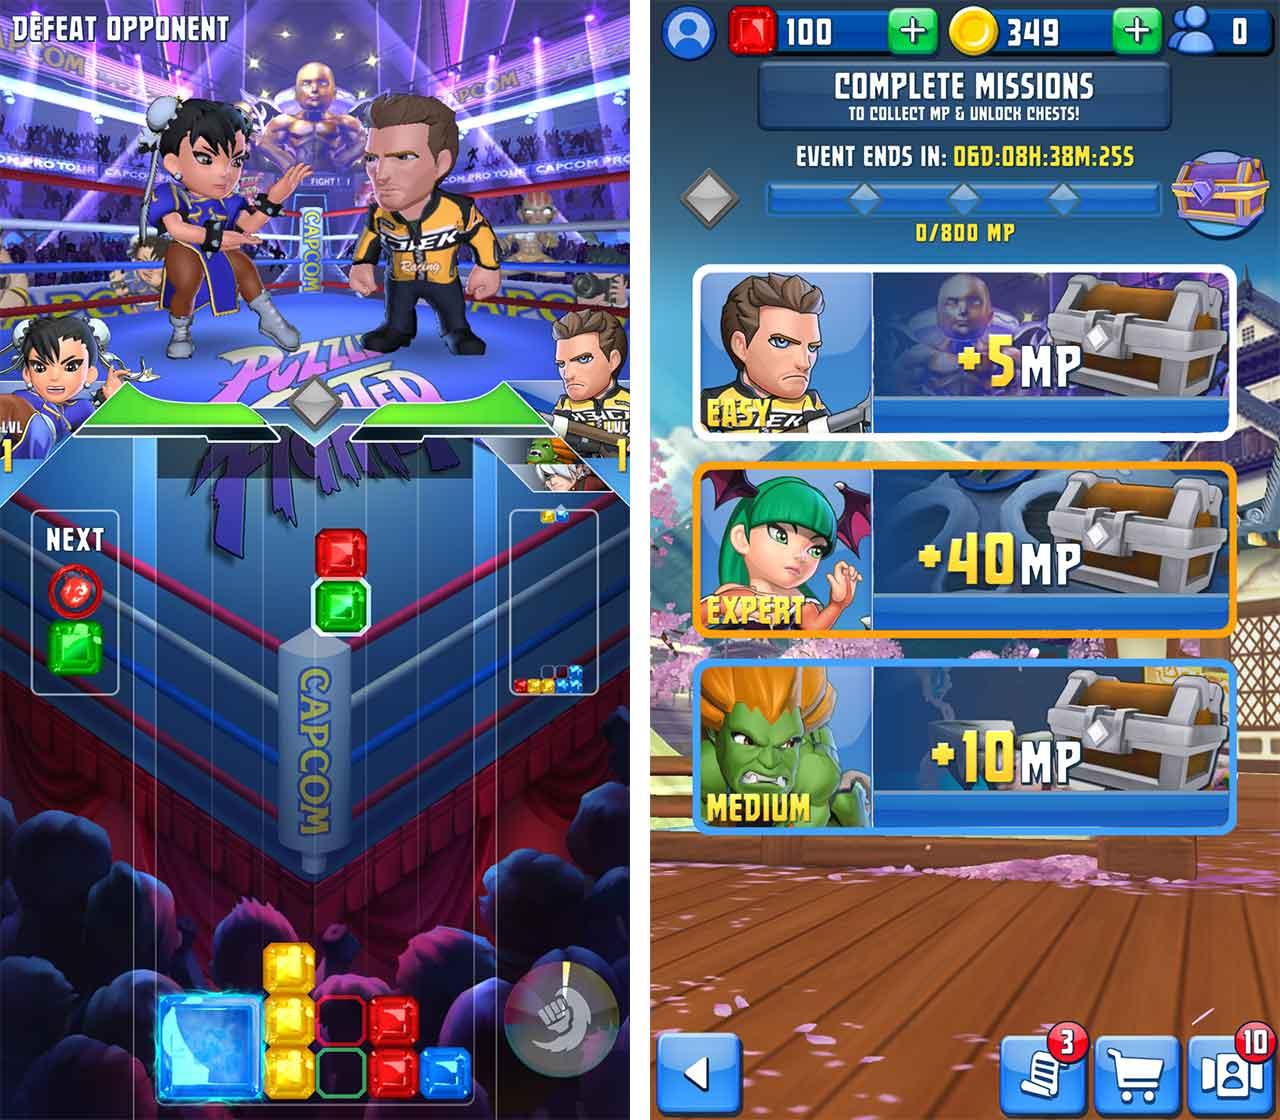 Puzzle Fighter Chun-Li